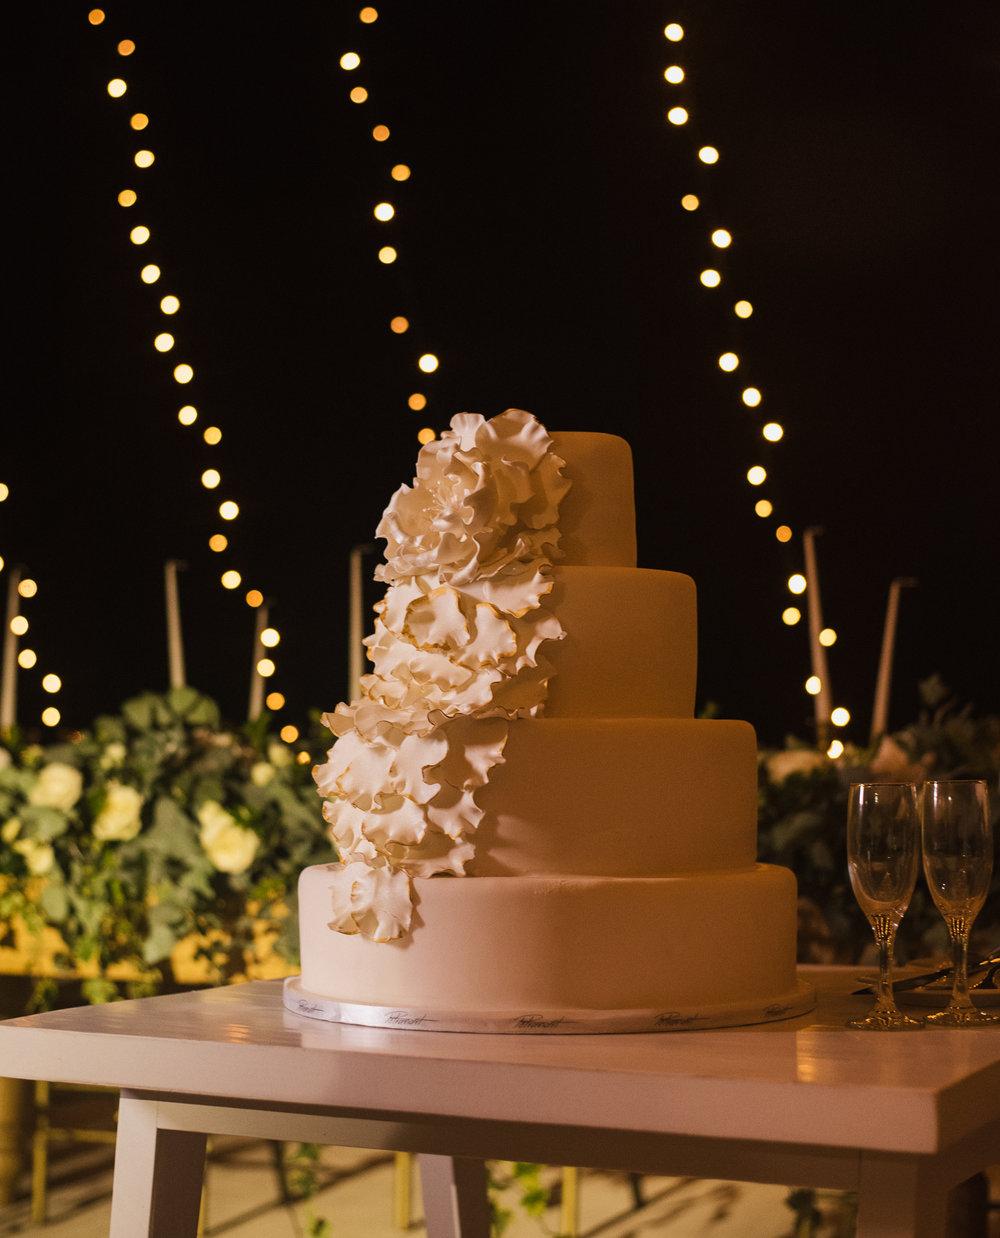 santorini-island-greece-wedding-dinner-celebration-groom-bride-sunset-wedding-table-crystal-charger-plate-flower-arrangement-dessert-table-naked-cake-decoration-fairy-lights-mini-bulbs-rocabella-hotel-silkentile-event-planning-firm